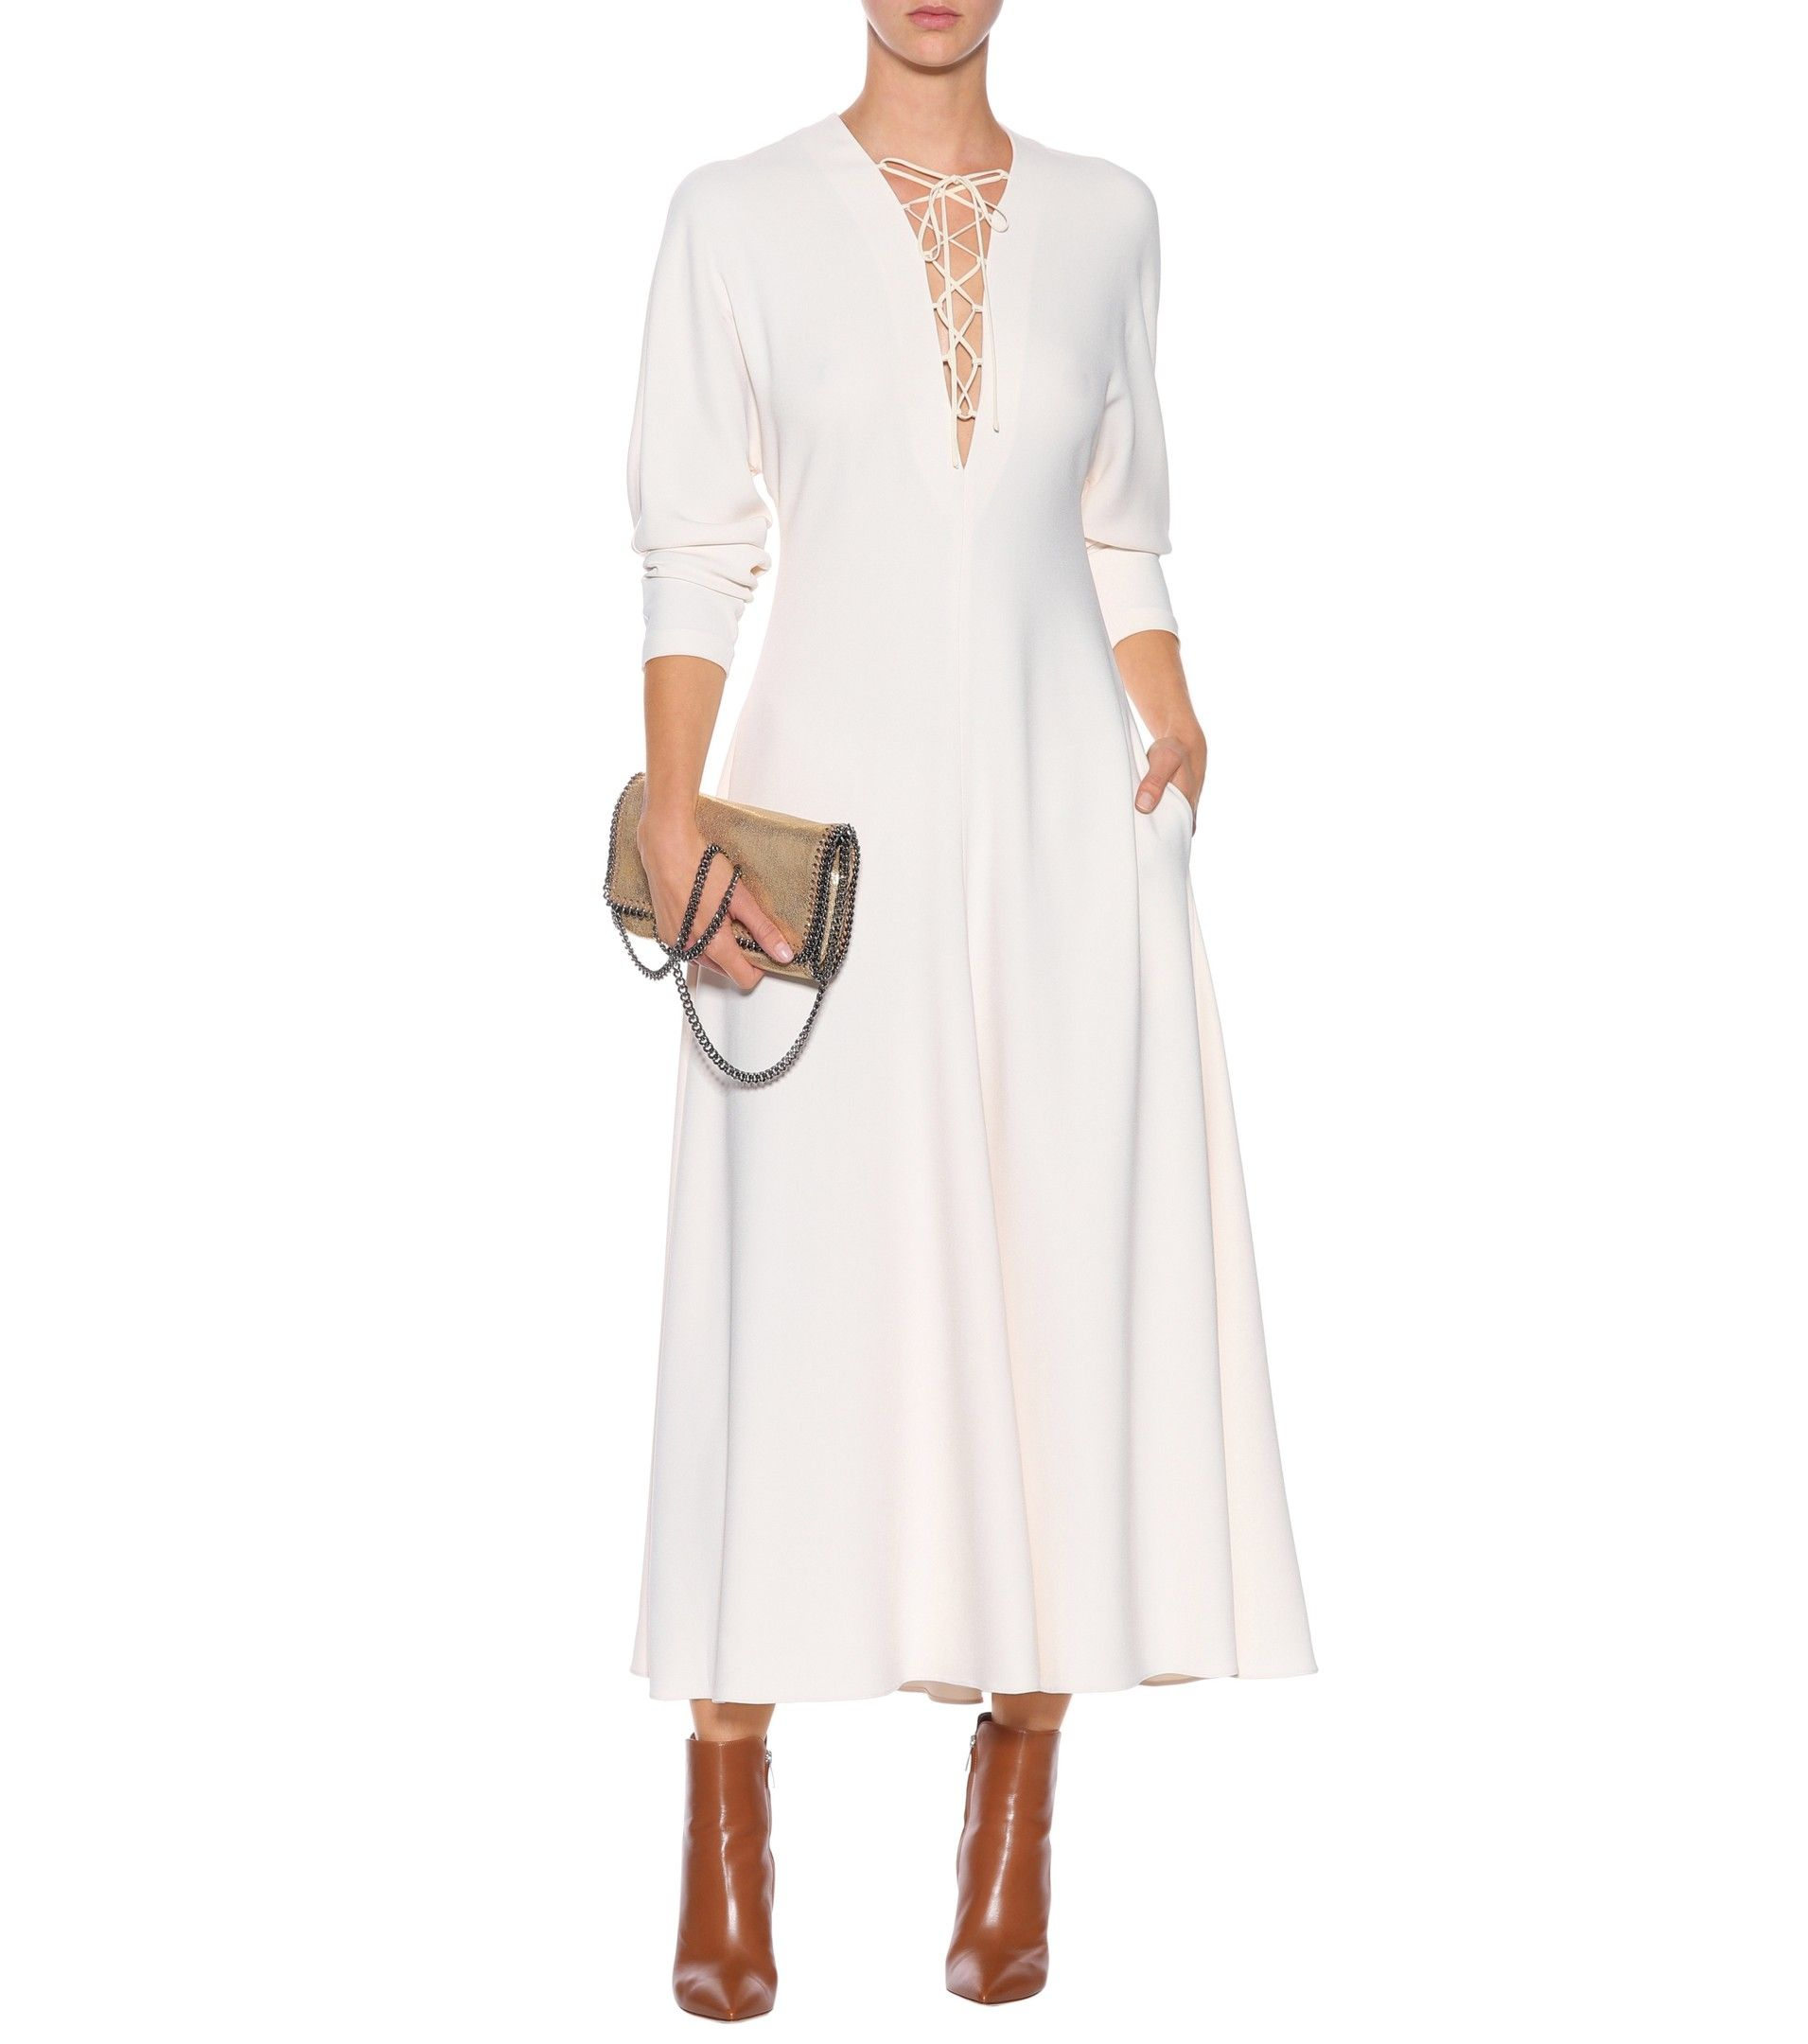 Stella Mccartney Juliet Stretch Cady Dress Mytheresa Com Dresses Mom Dress Long Sleeve Dress [ 2160 x 1911 Pixel ]